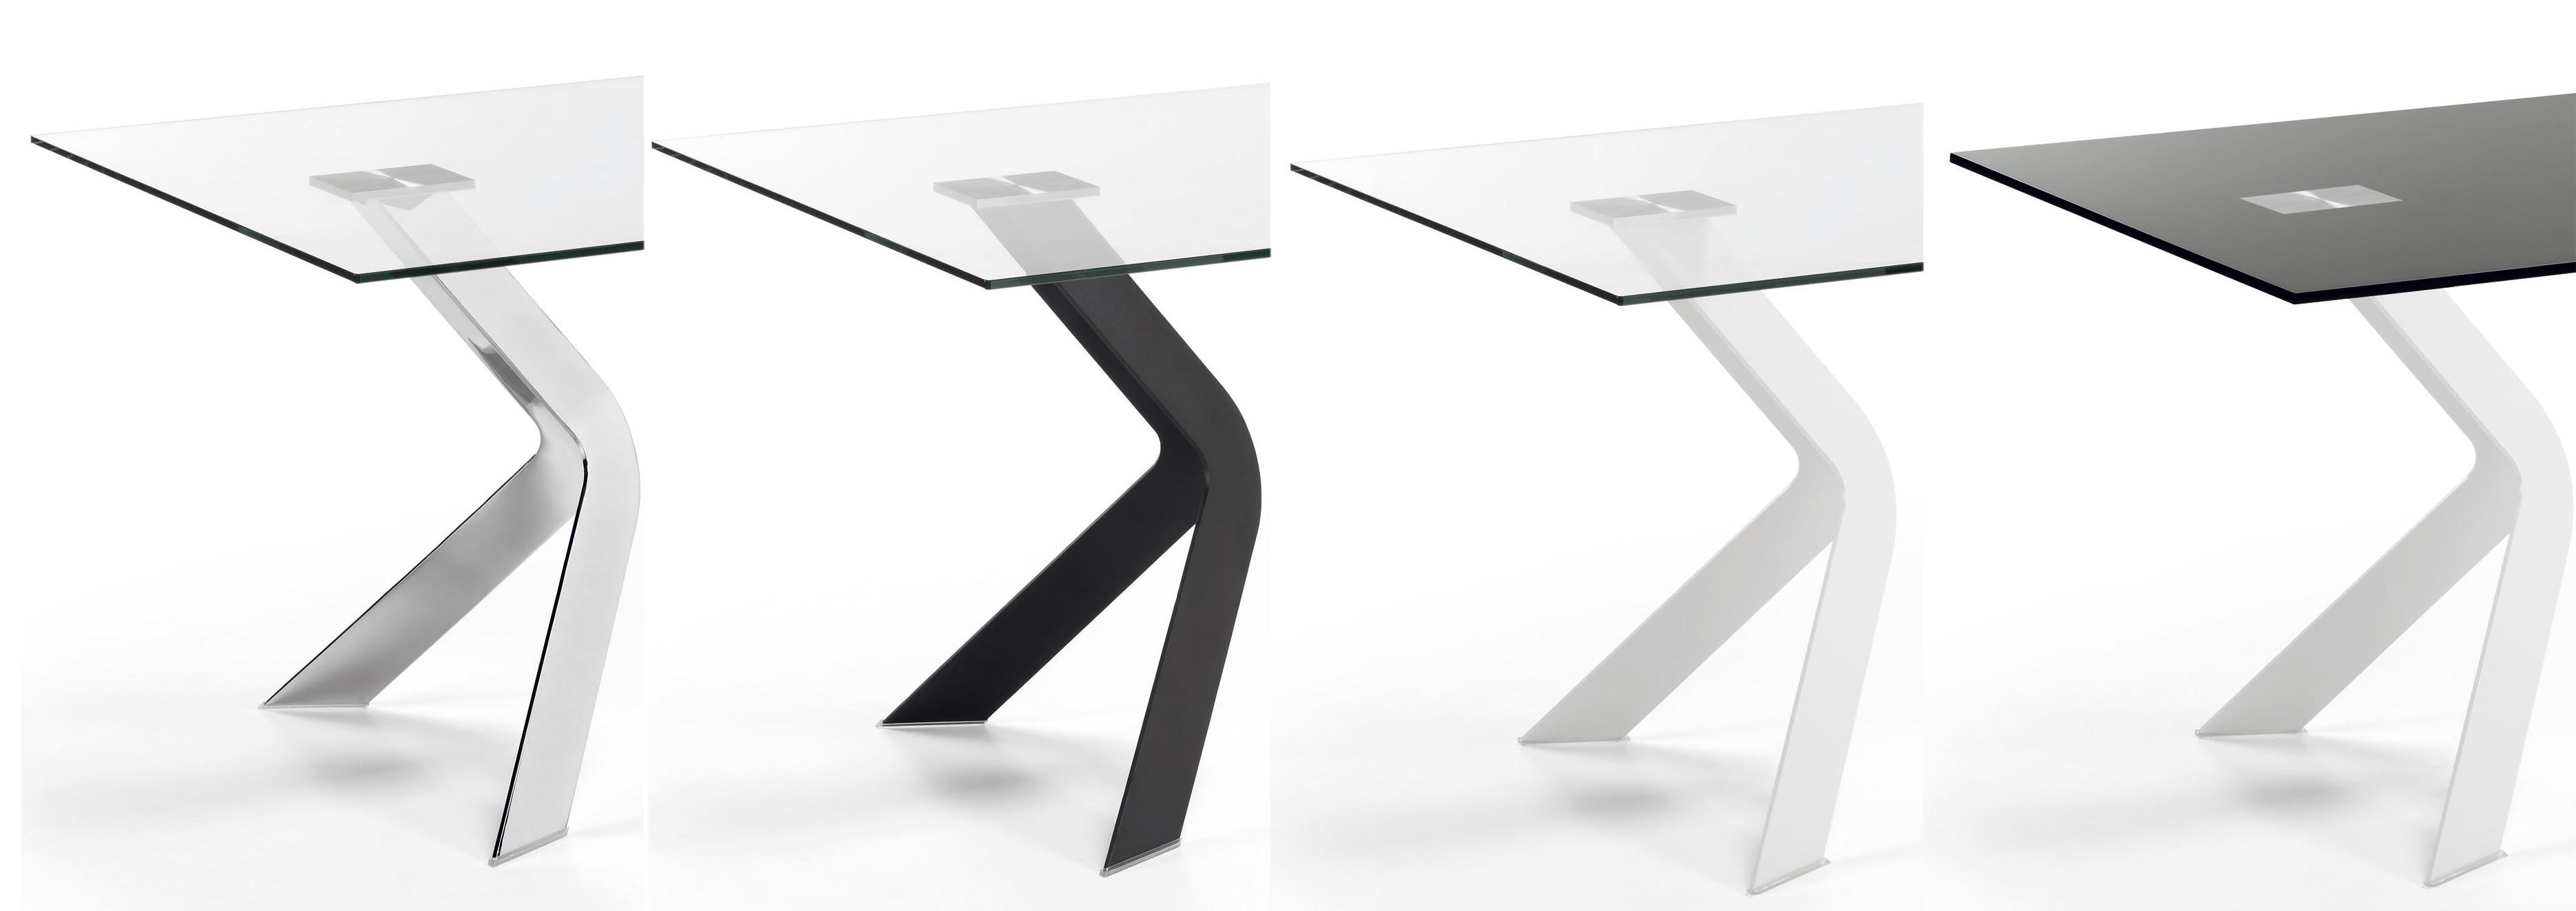 Mesa de dise o de cristal patas metalicas for Mesas de centro metalicas